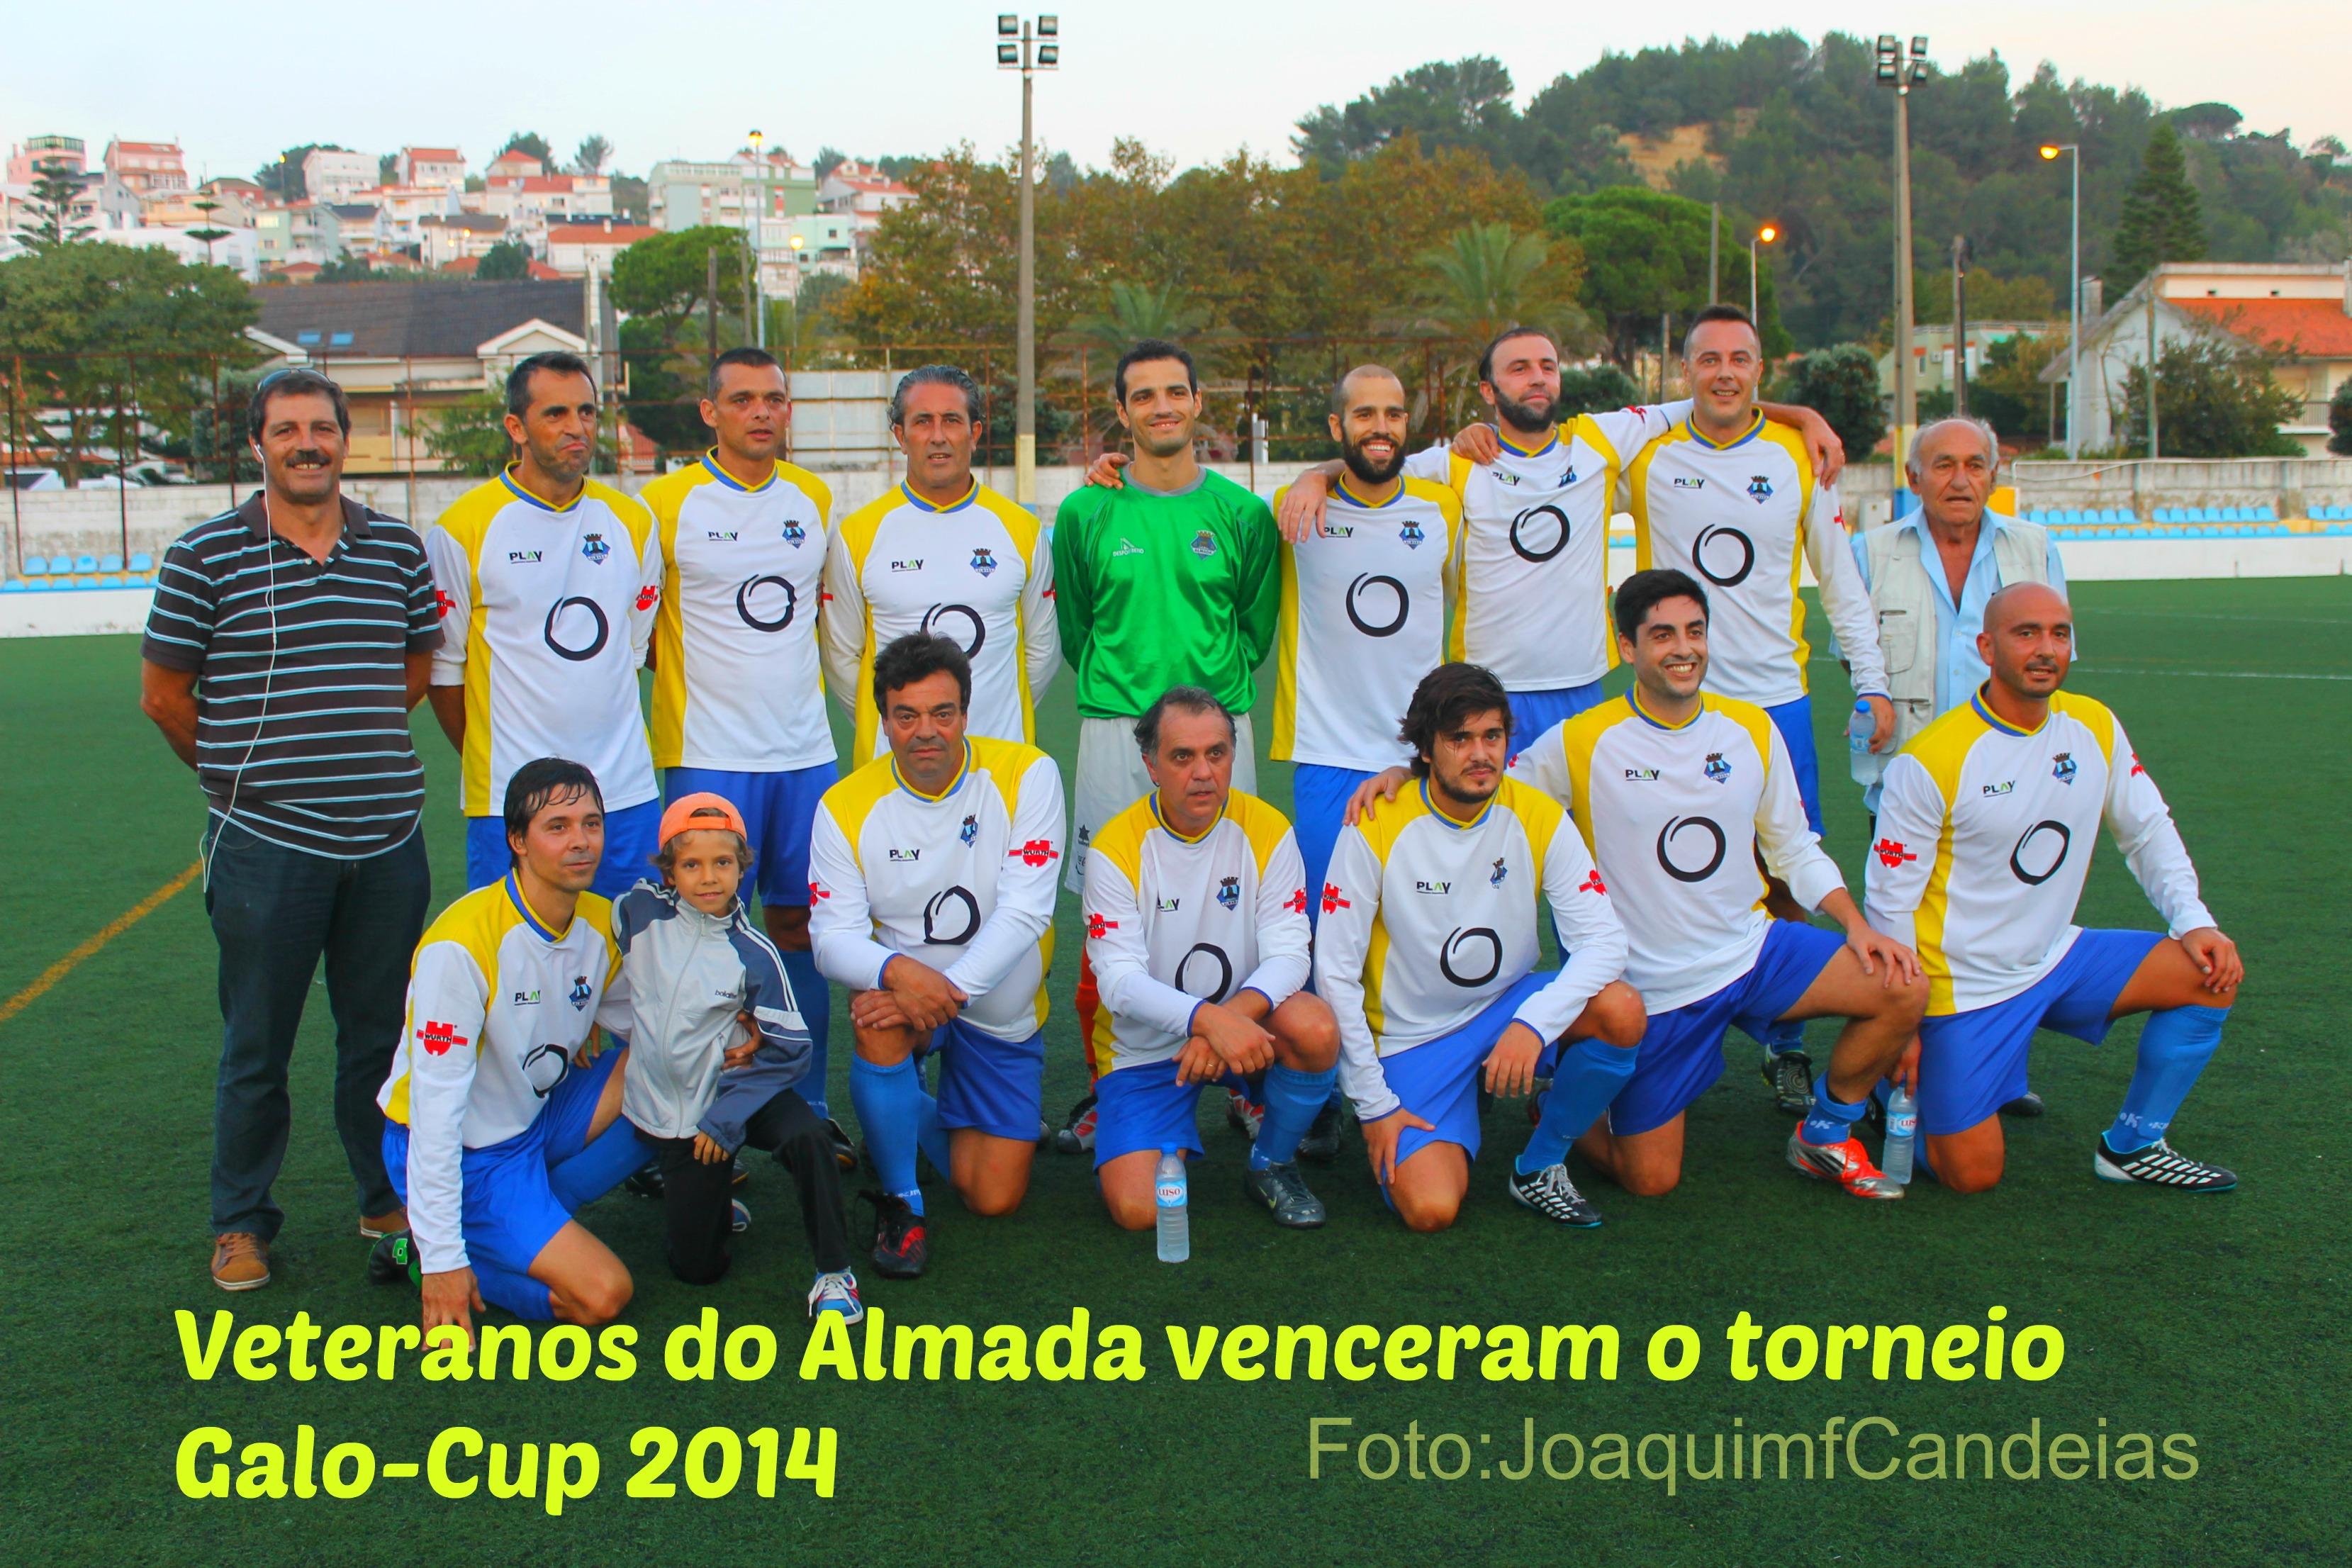 Torneio Galo Cup IMG_0638.jpg JoaquimfCandeias.jpg